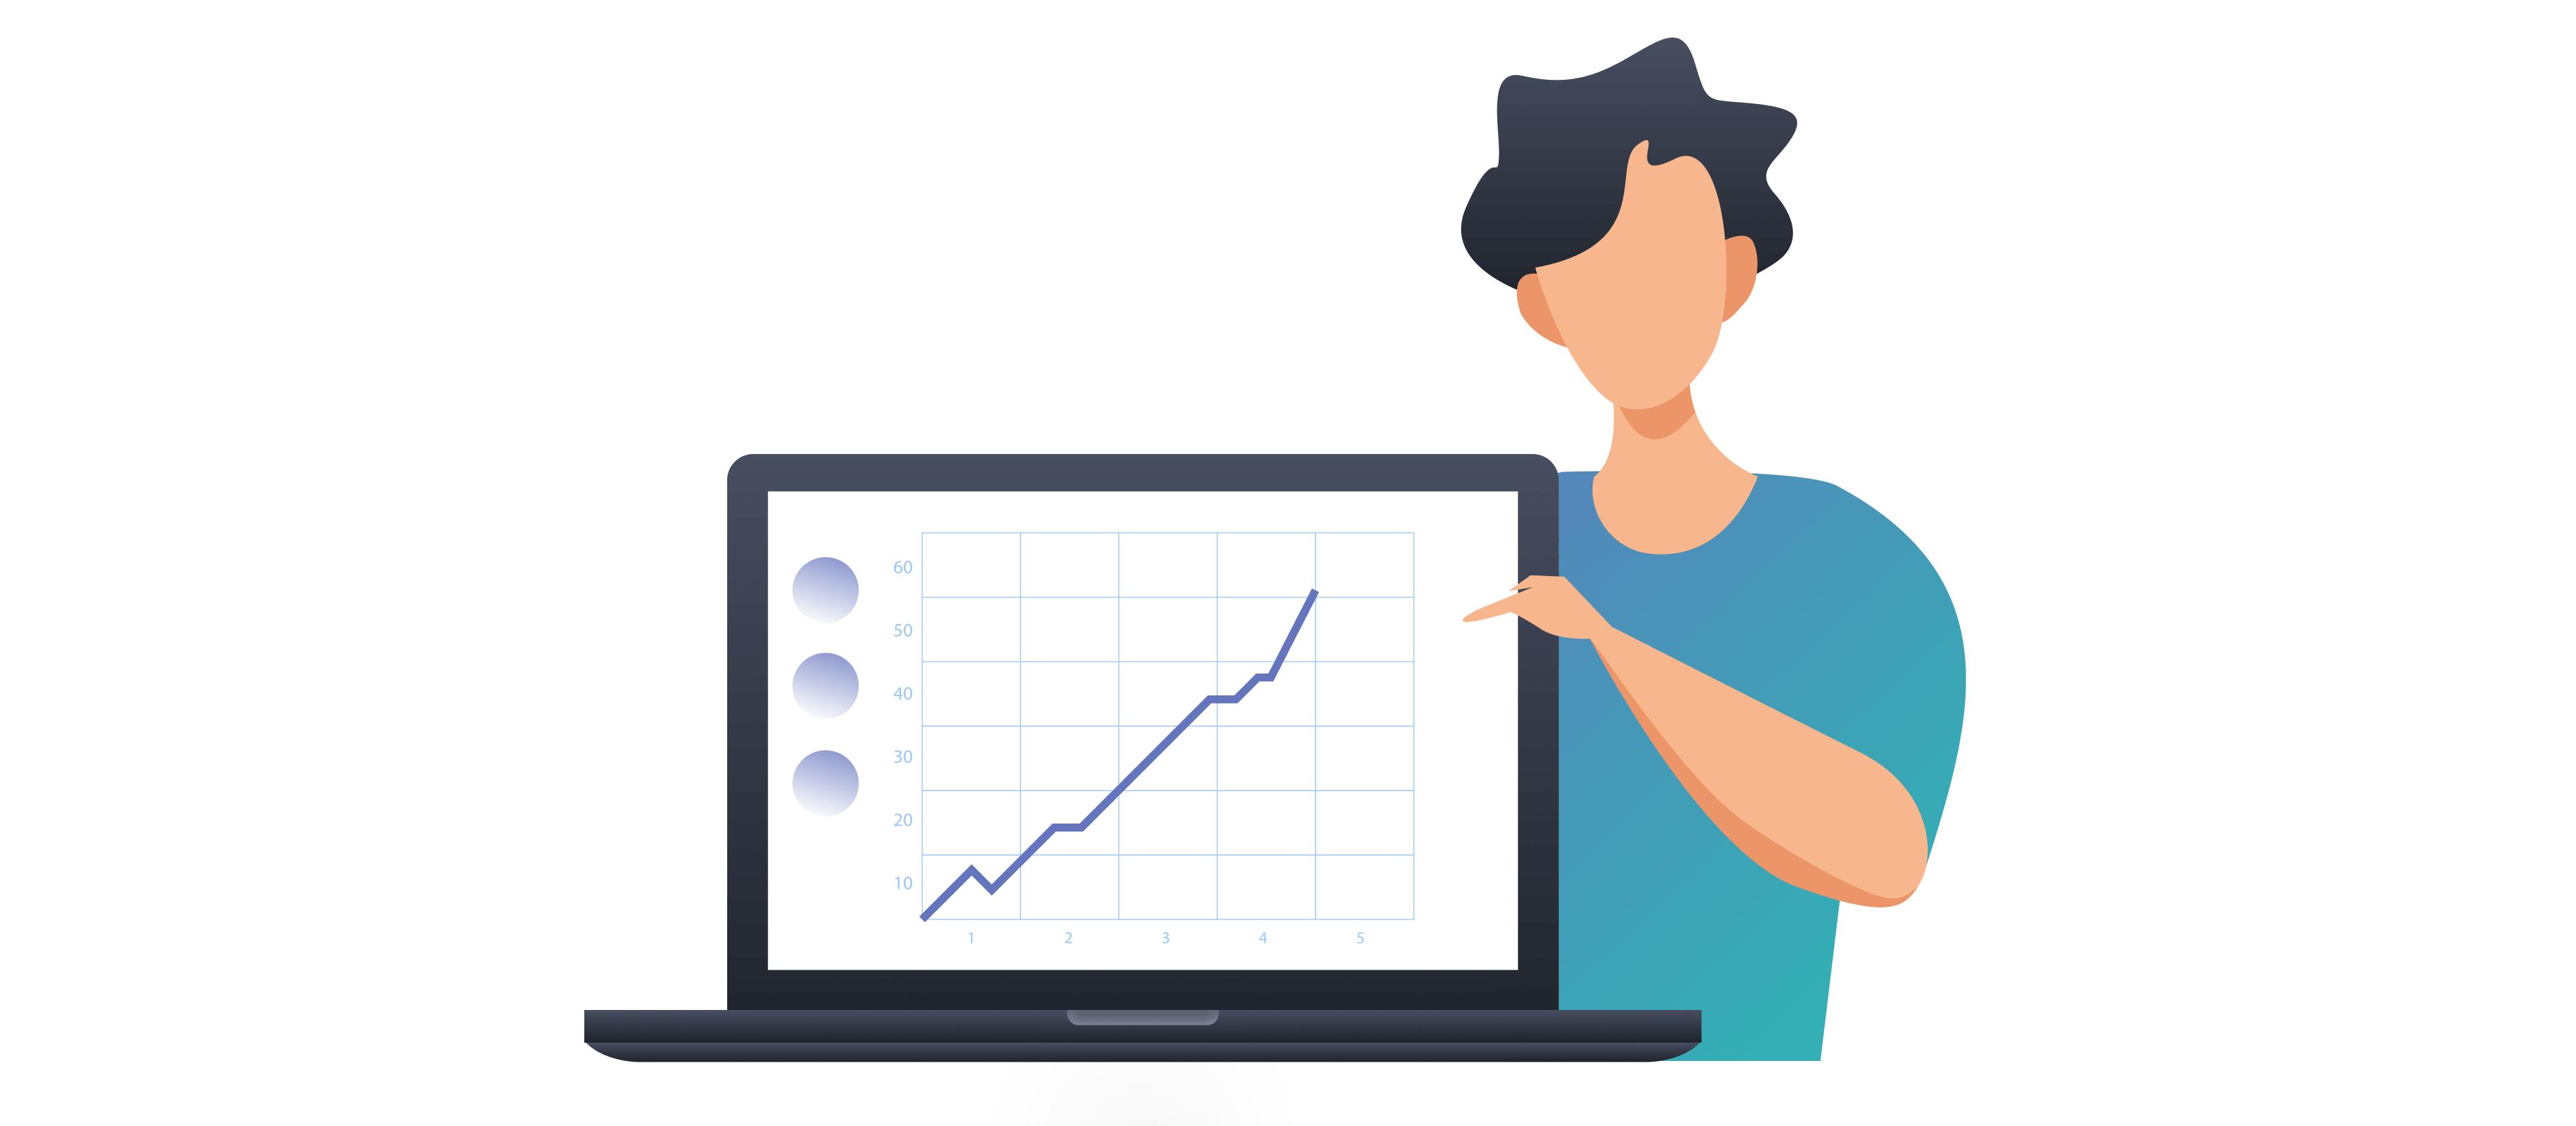 benefits of multi-cloud - image